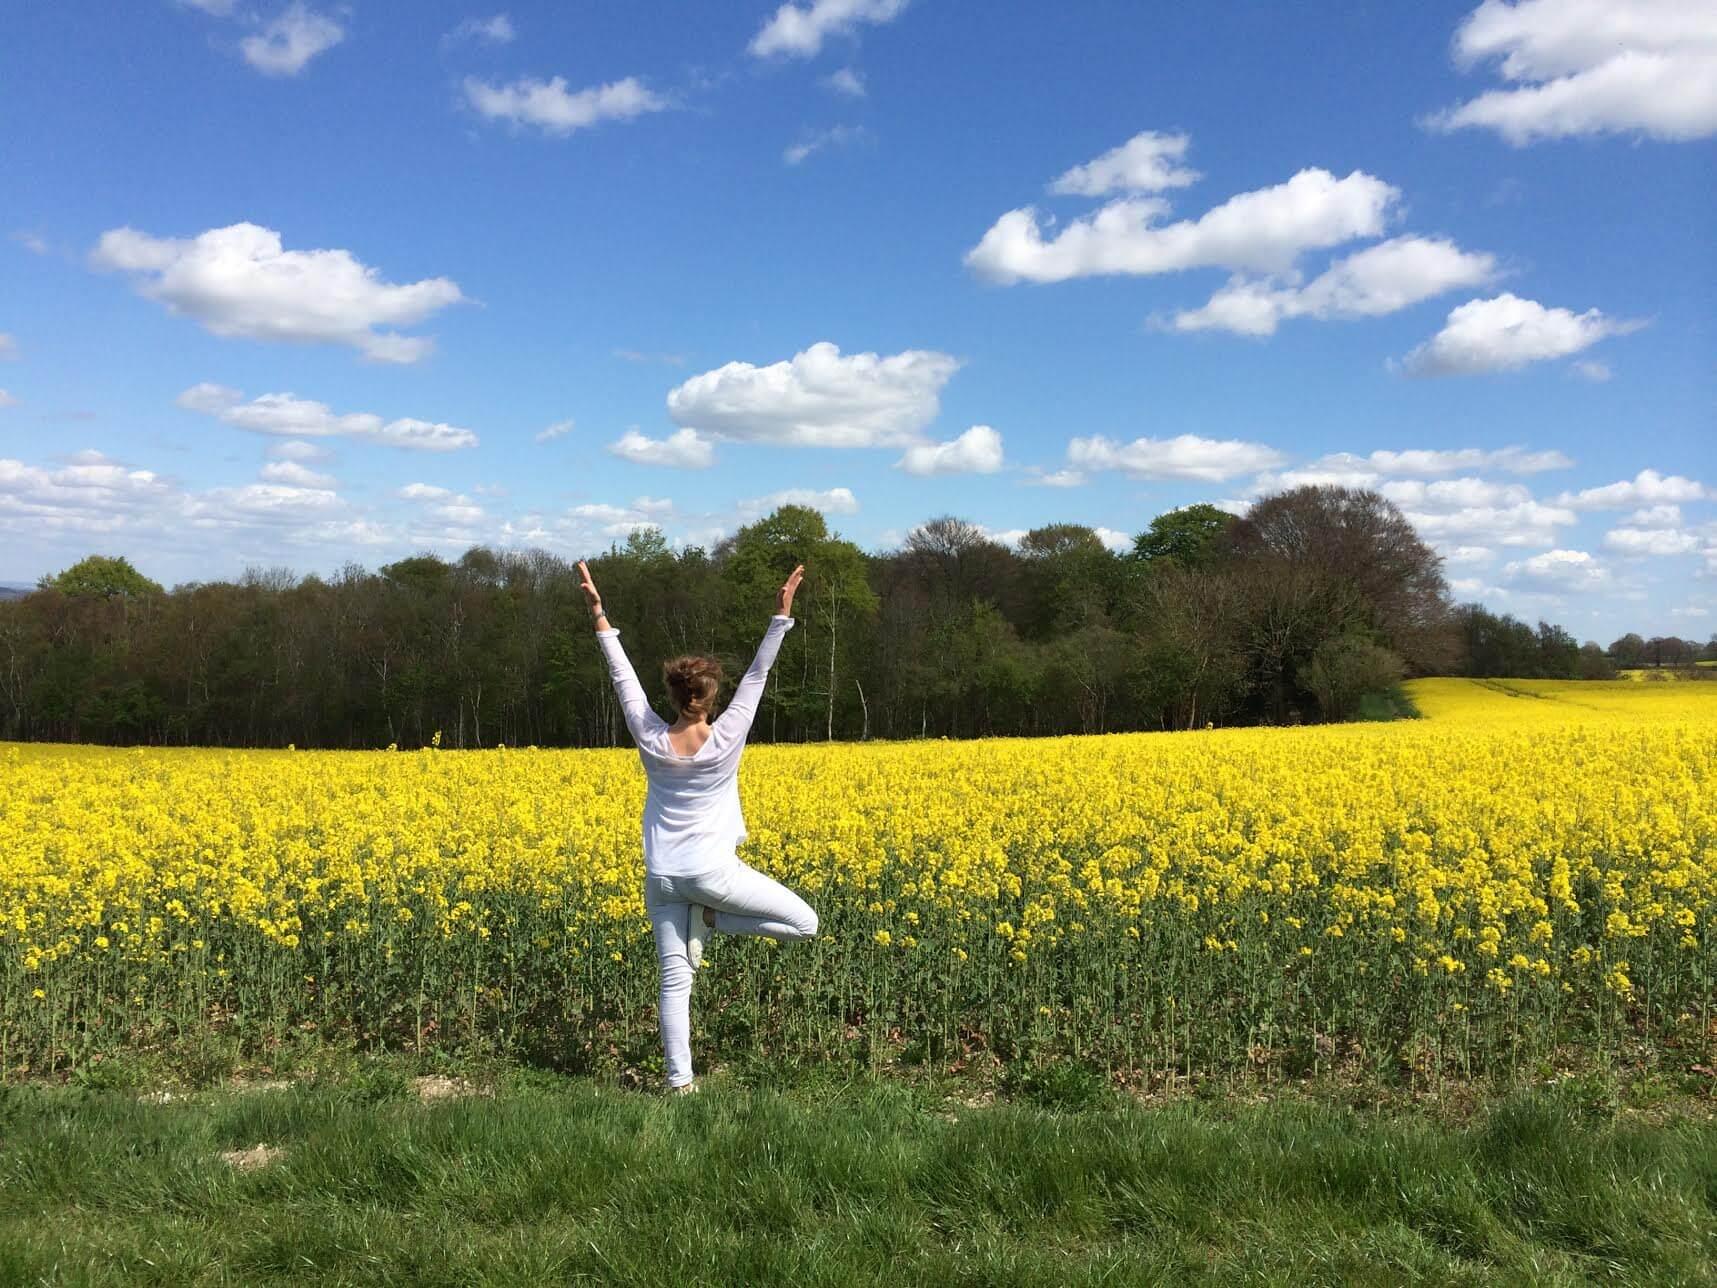 yoga retreats 2017, best new yoga classes in london, new yoga classes in london, new yoga london, new yoga class in london, new yoga class london, yoga london february, yoga london february 2017, yoga february 2017